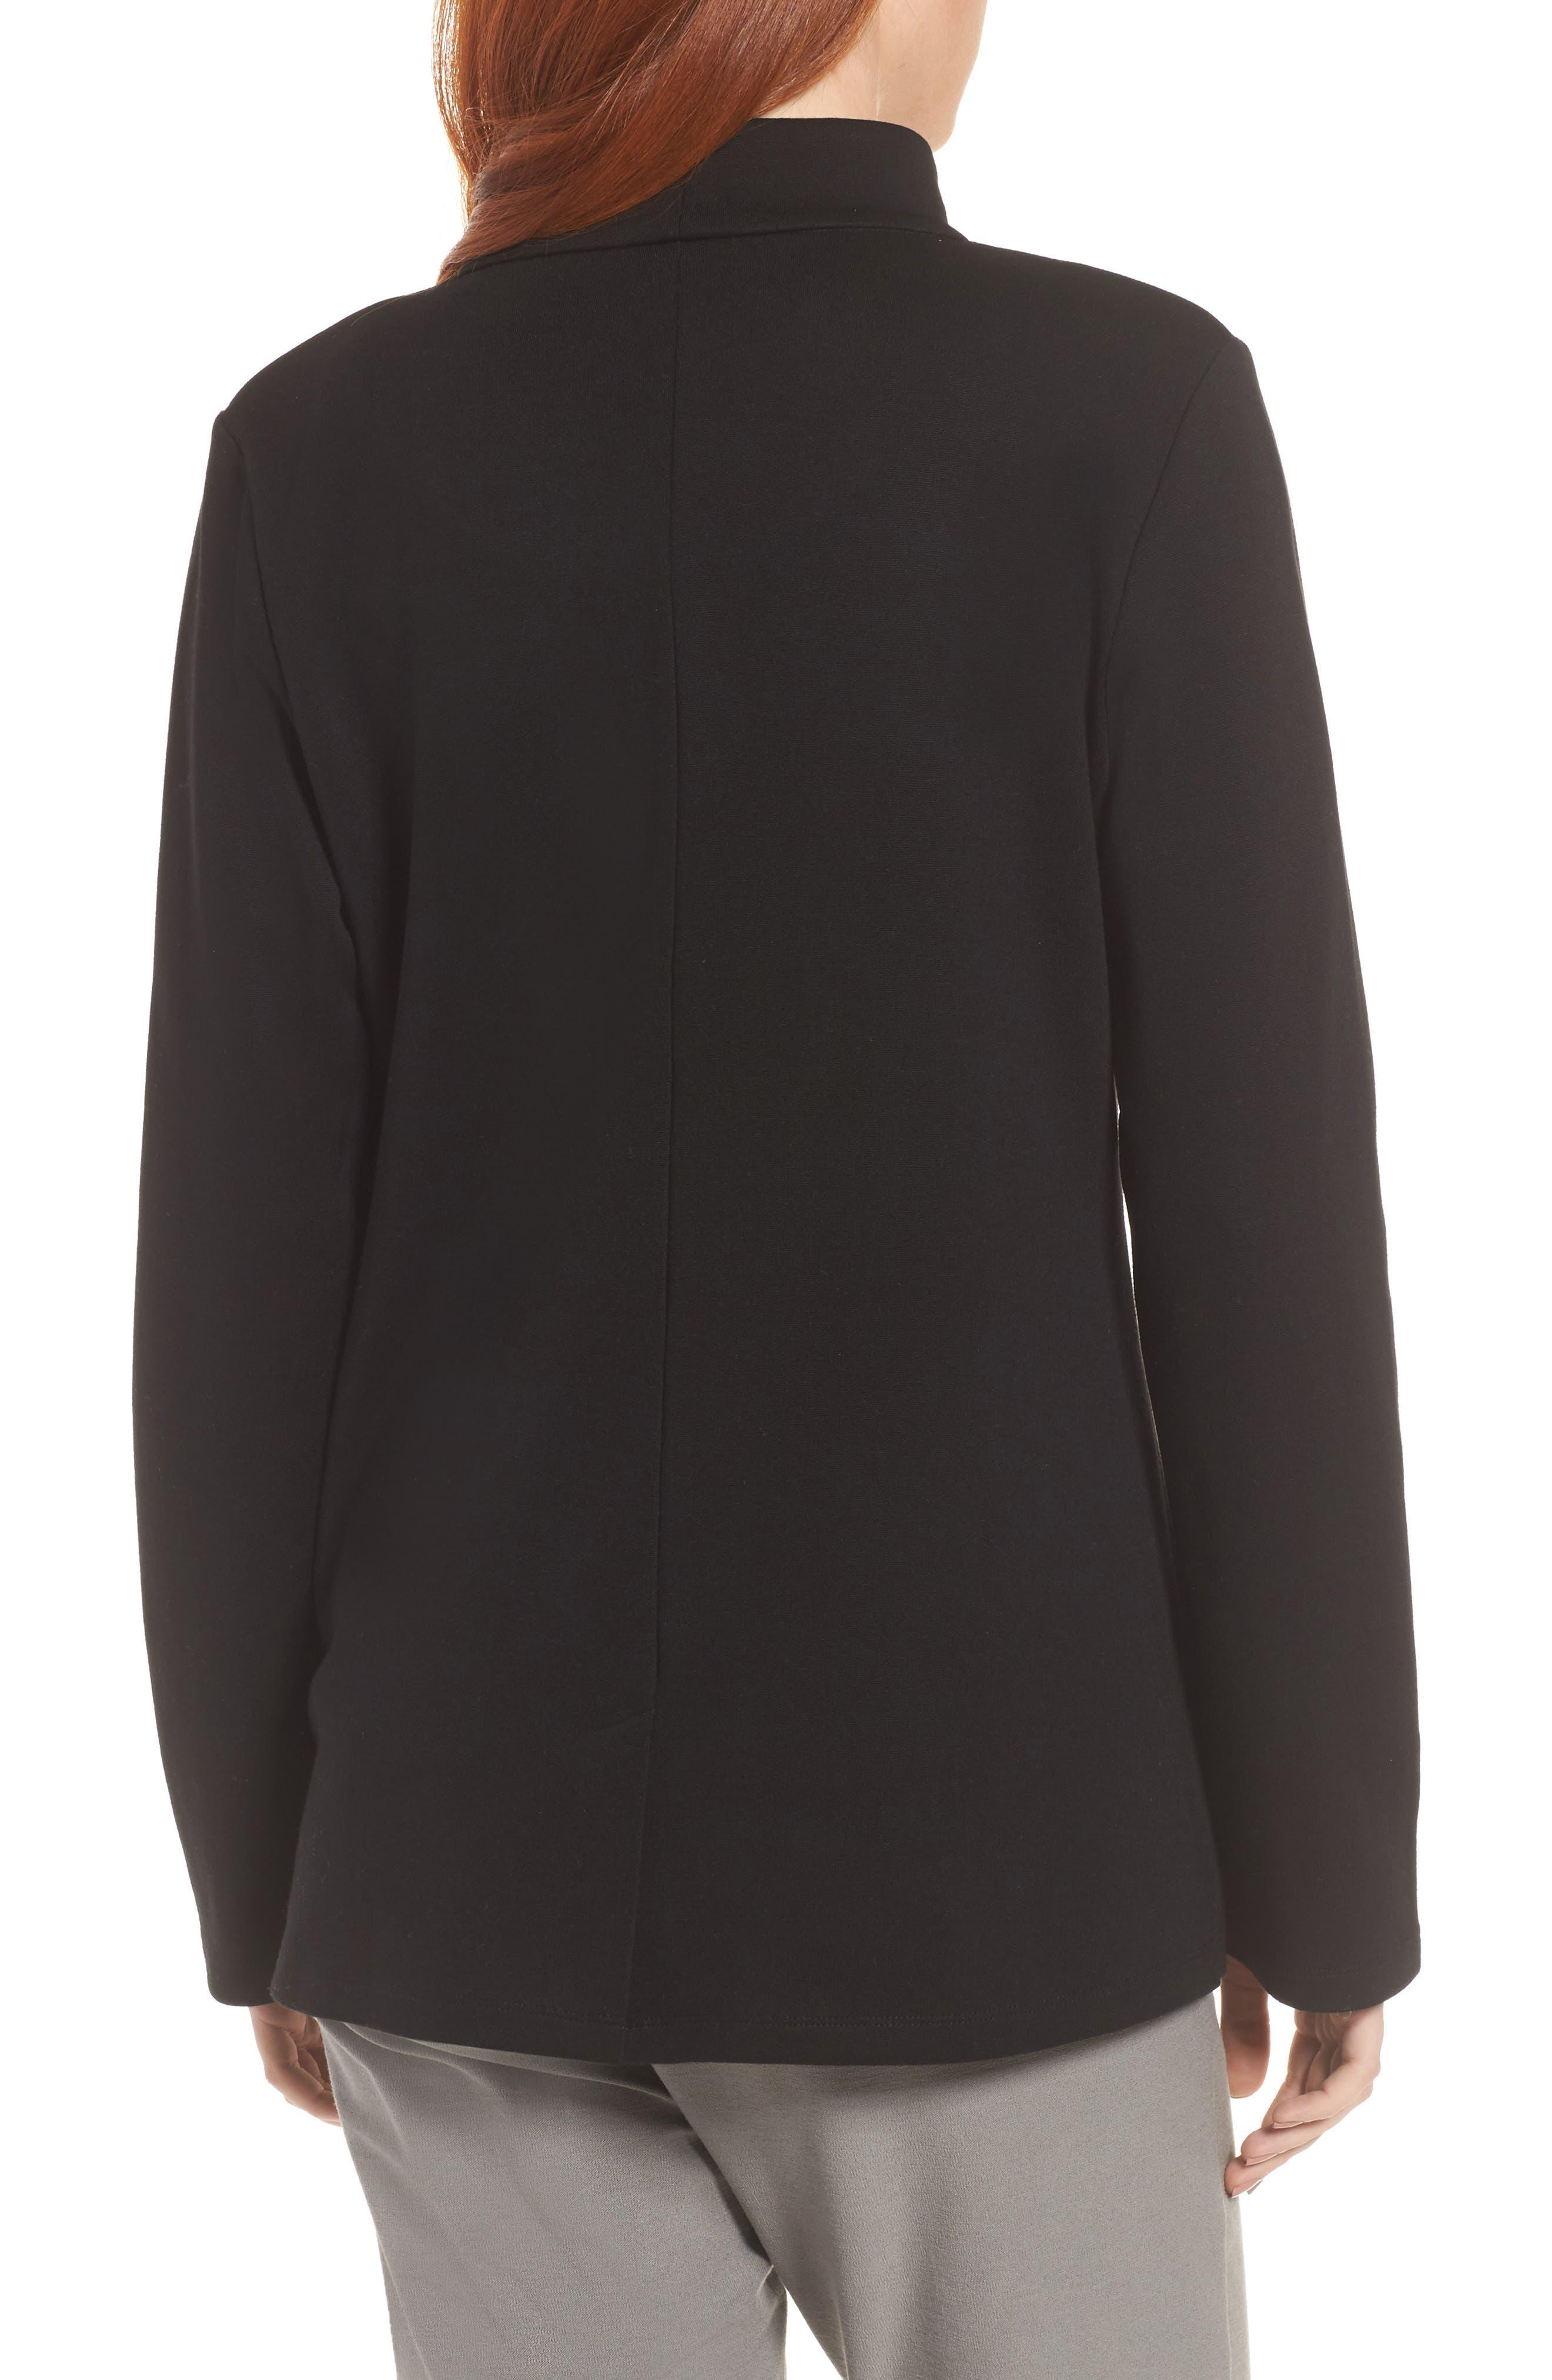 Tencel<sup>®</sup> Lyocell Blend Knit Blazer,                             Alternate thumbnail 2, color,                             Black